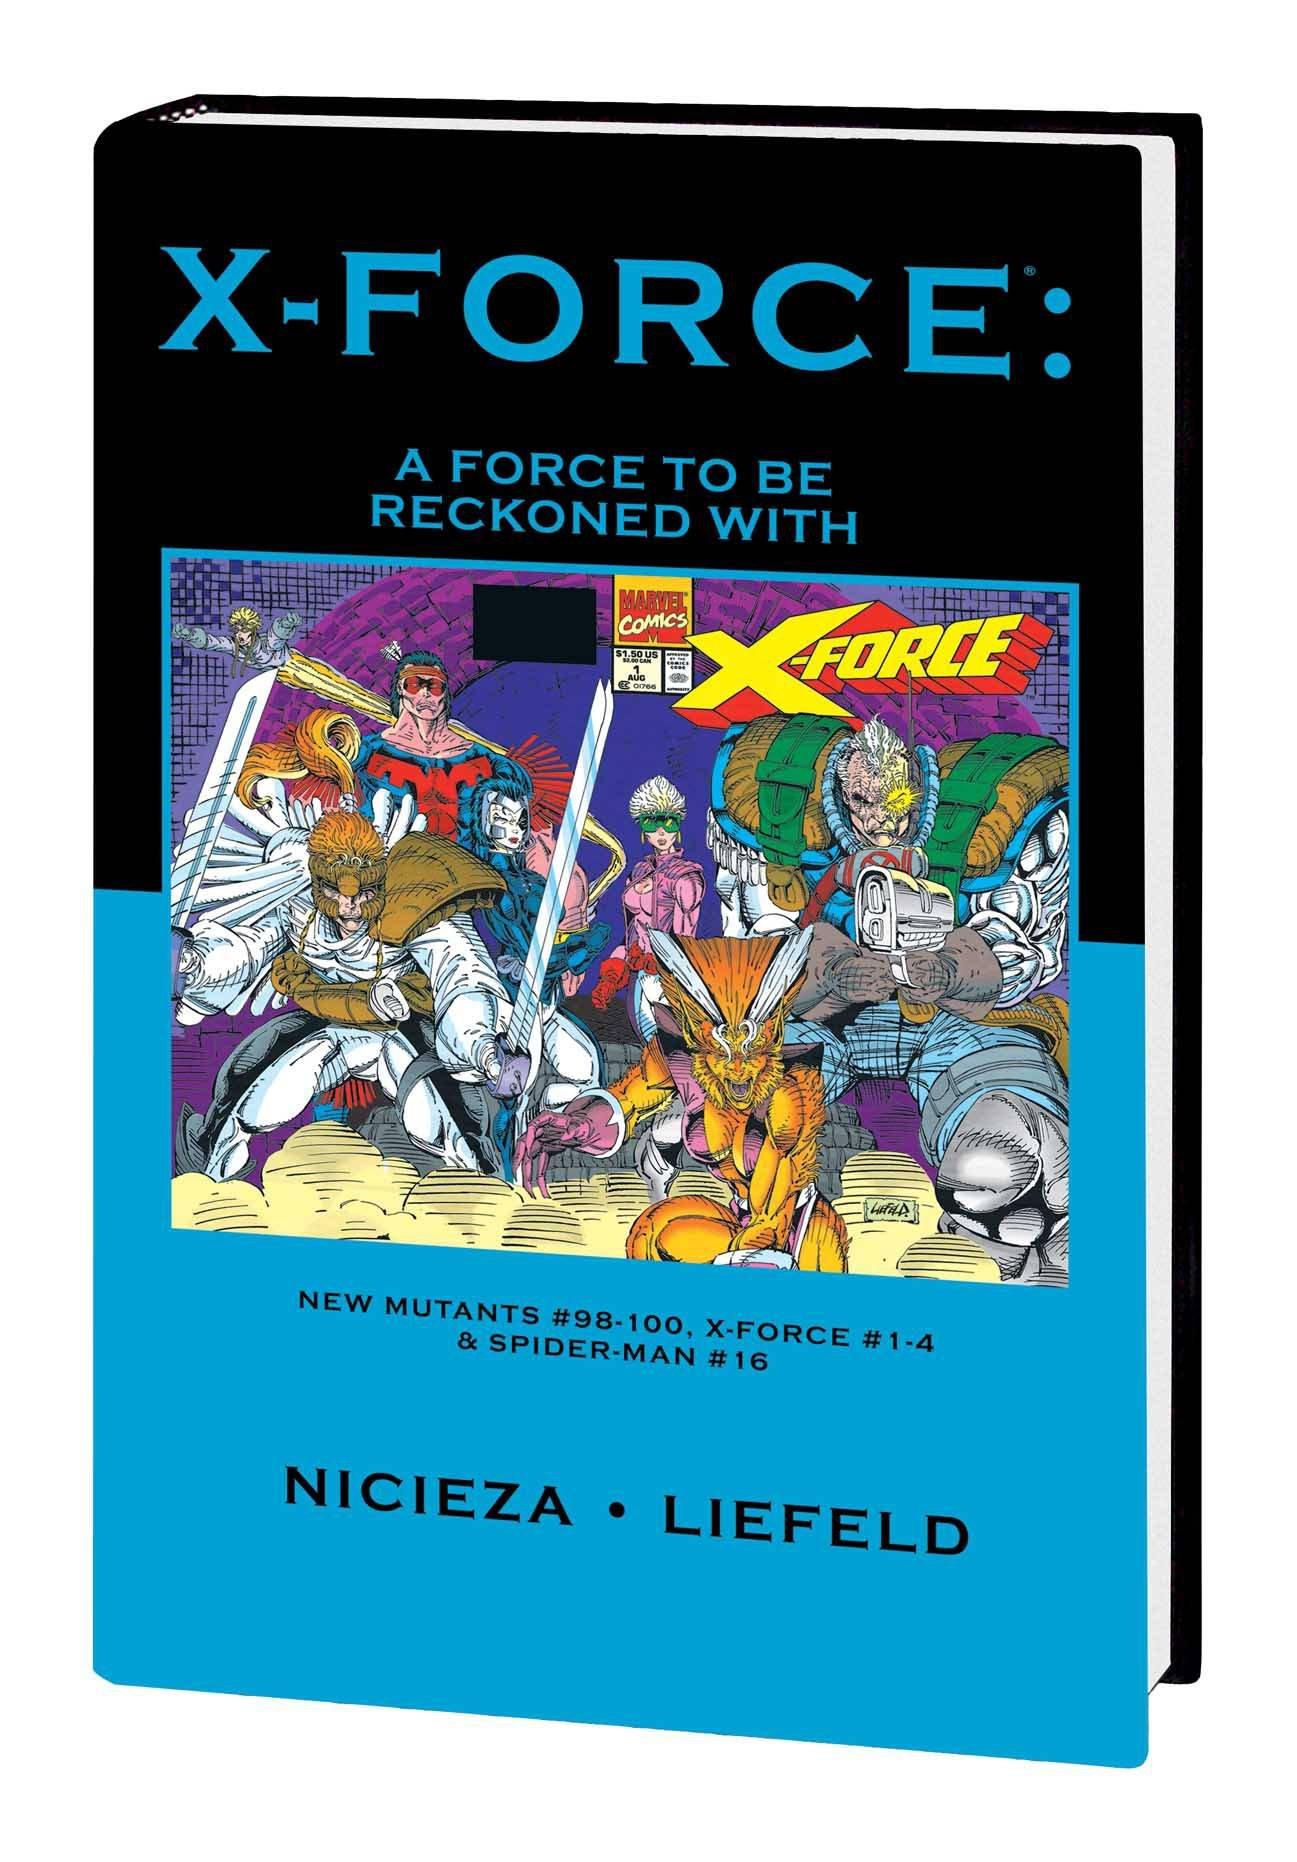 X-FORCE PREM HC FORCE TO BE RECKONED WITH DM VAR ED (X-FORCE, PREM HC FORCE TO BE RECKONED WITH DM VAR ED) ebook